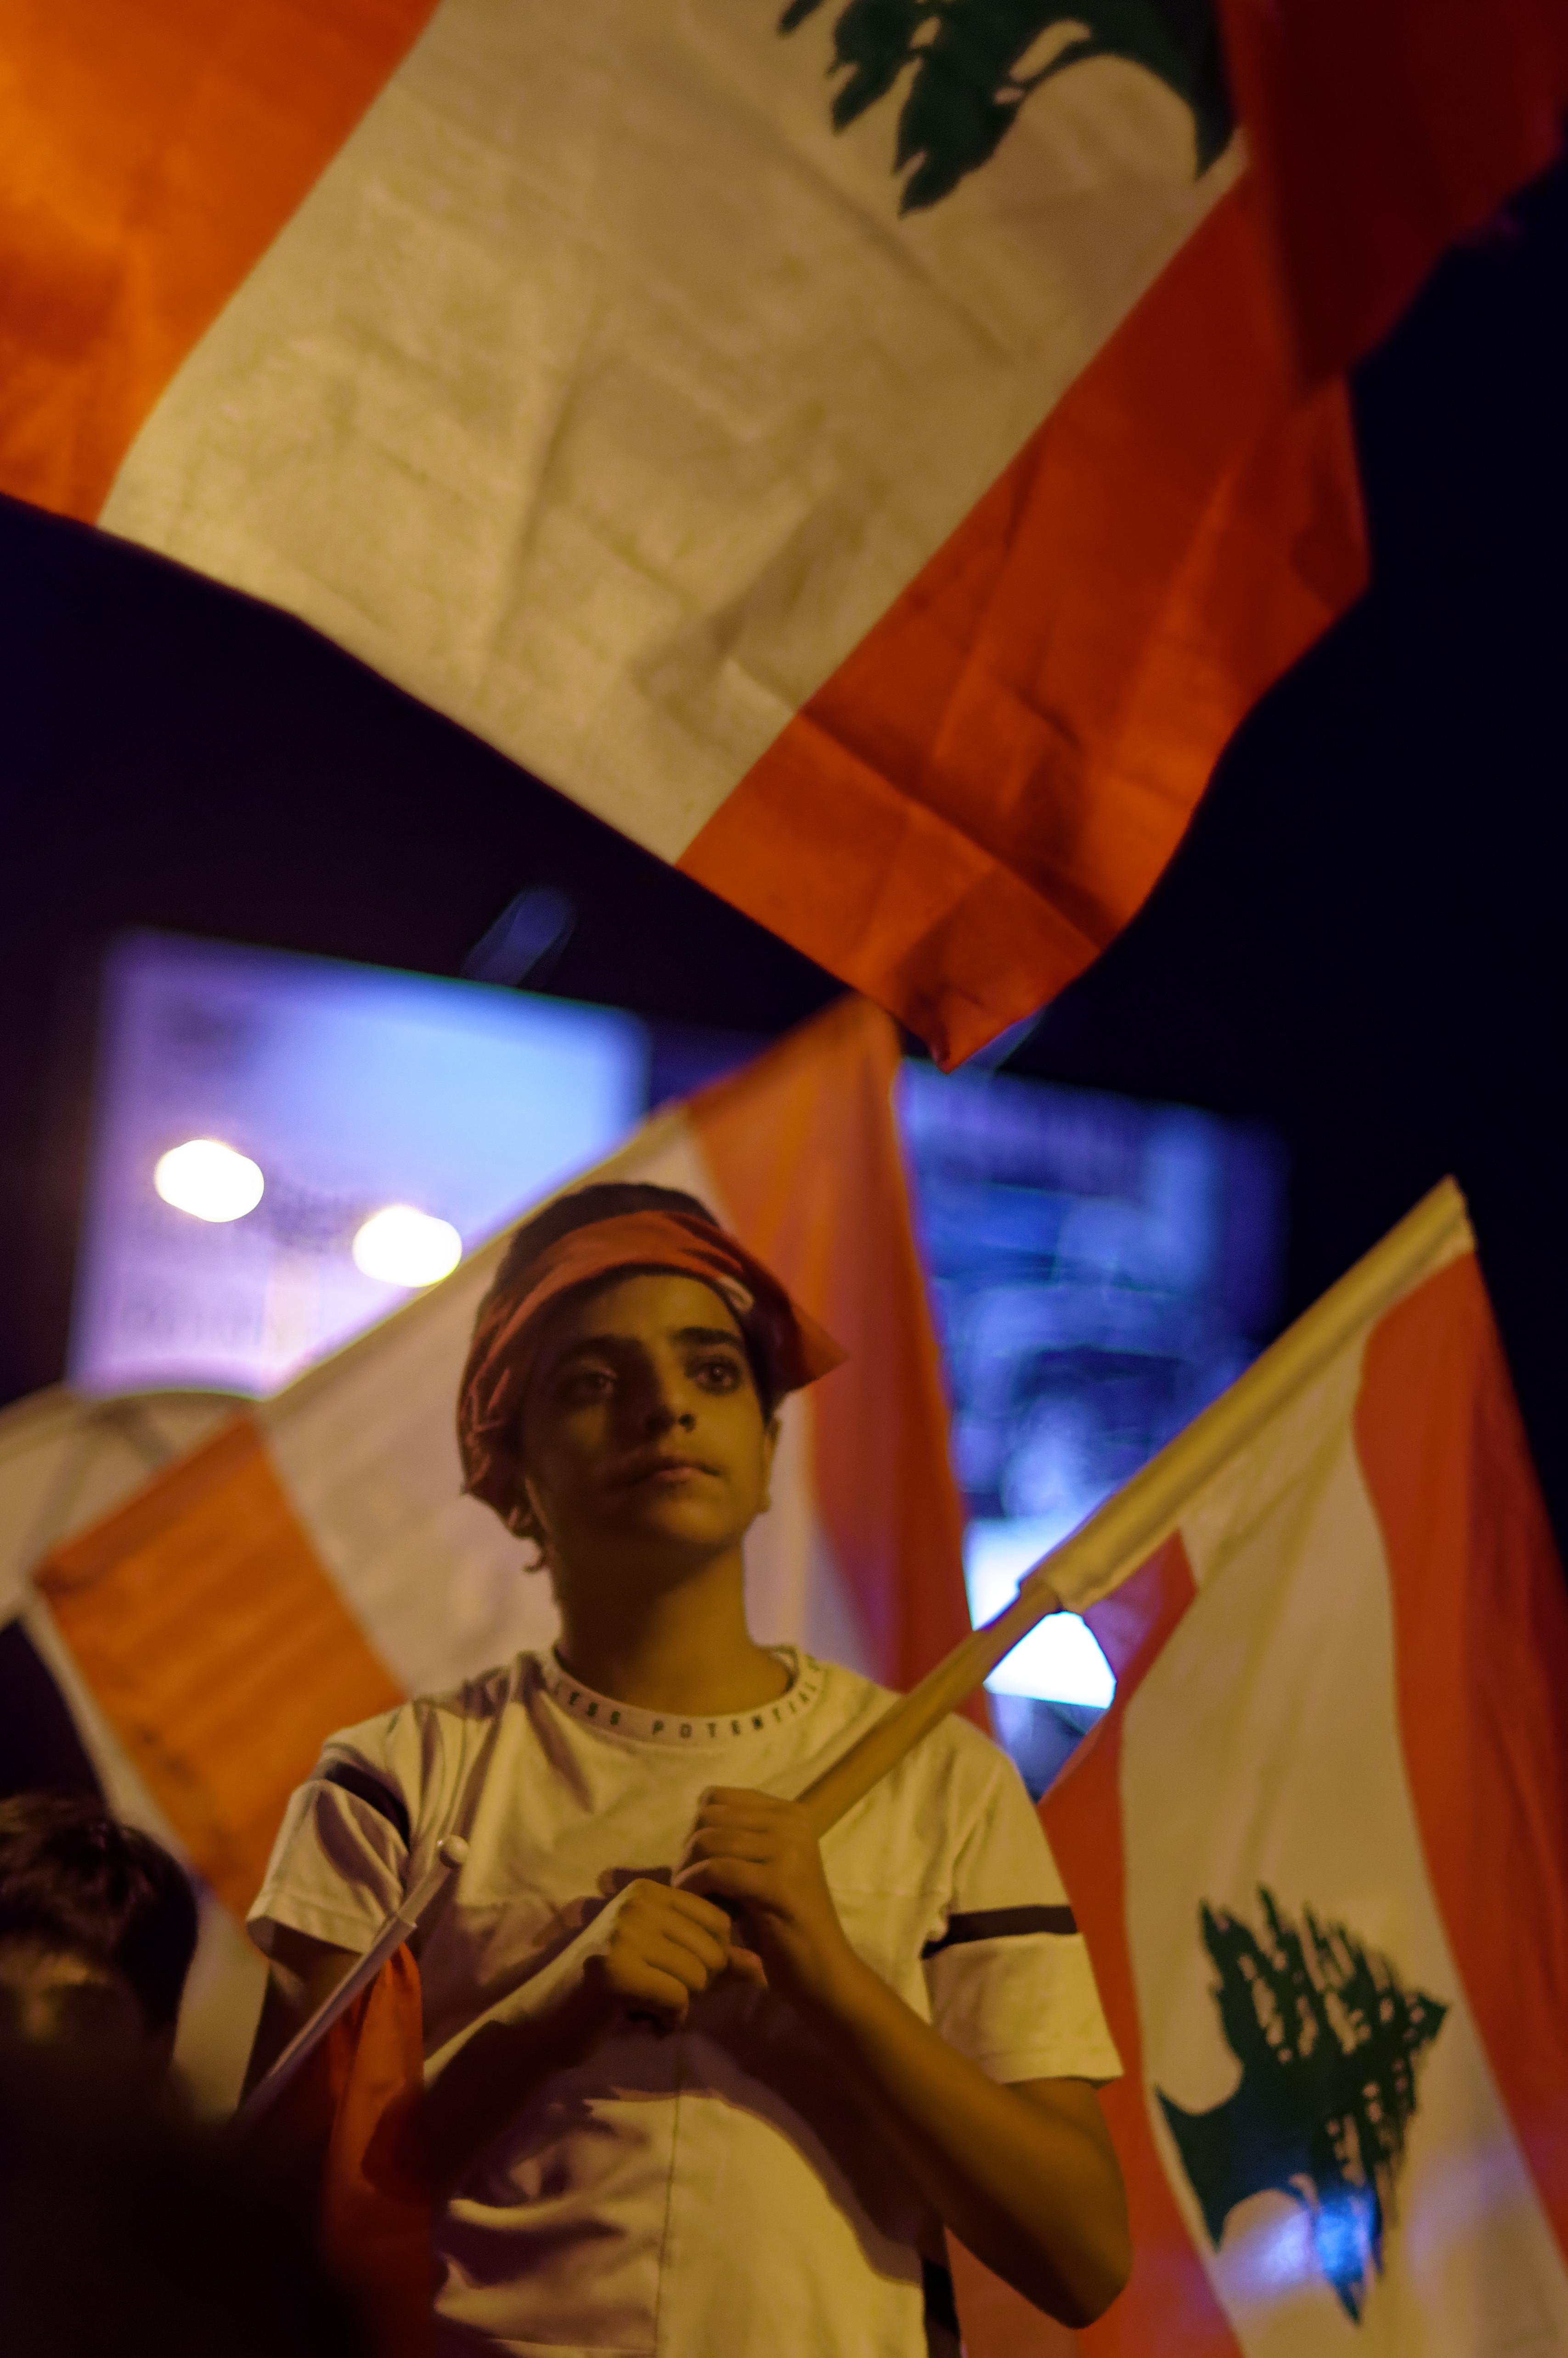 Lebanon: A word fitly spoken